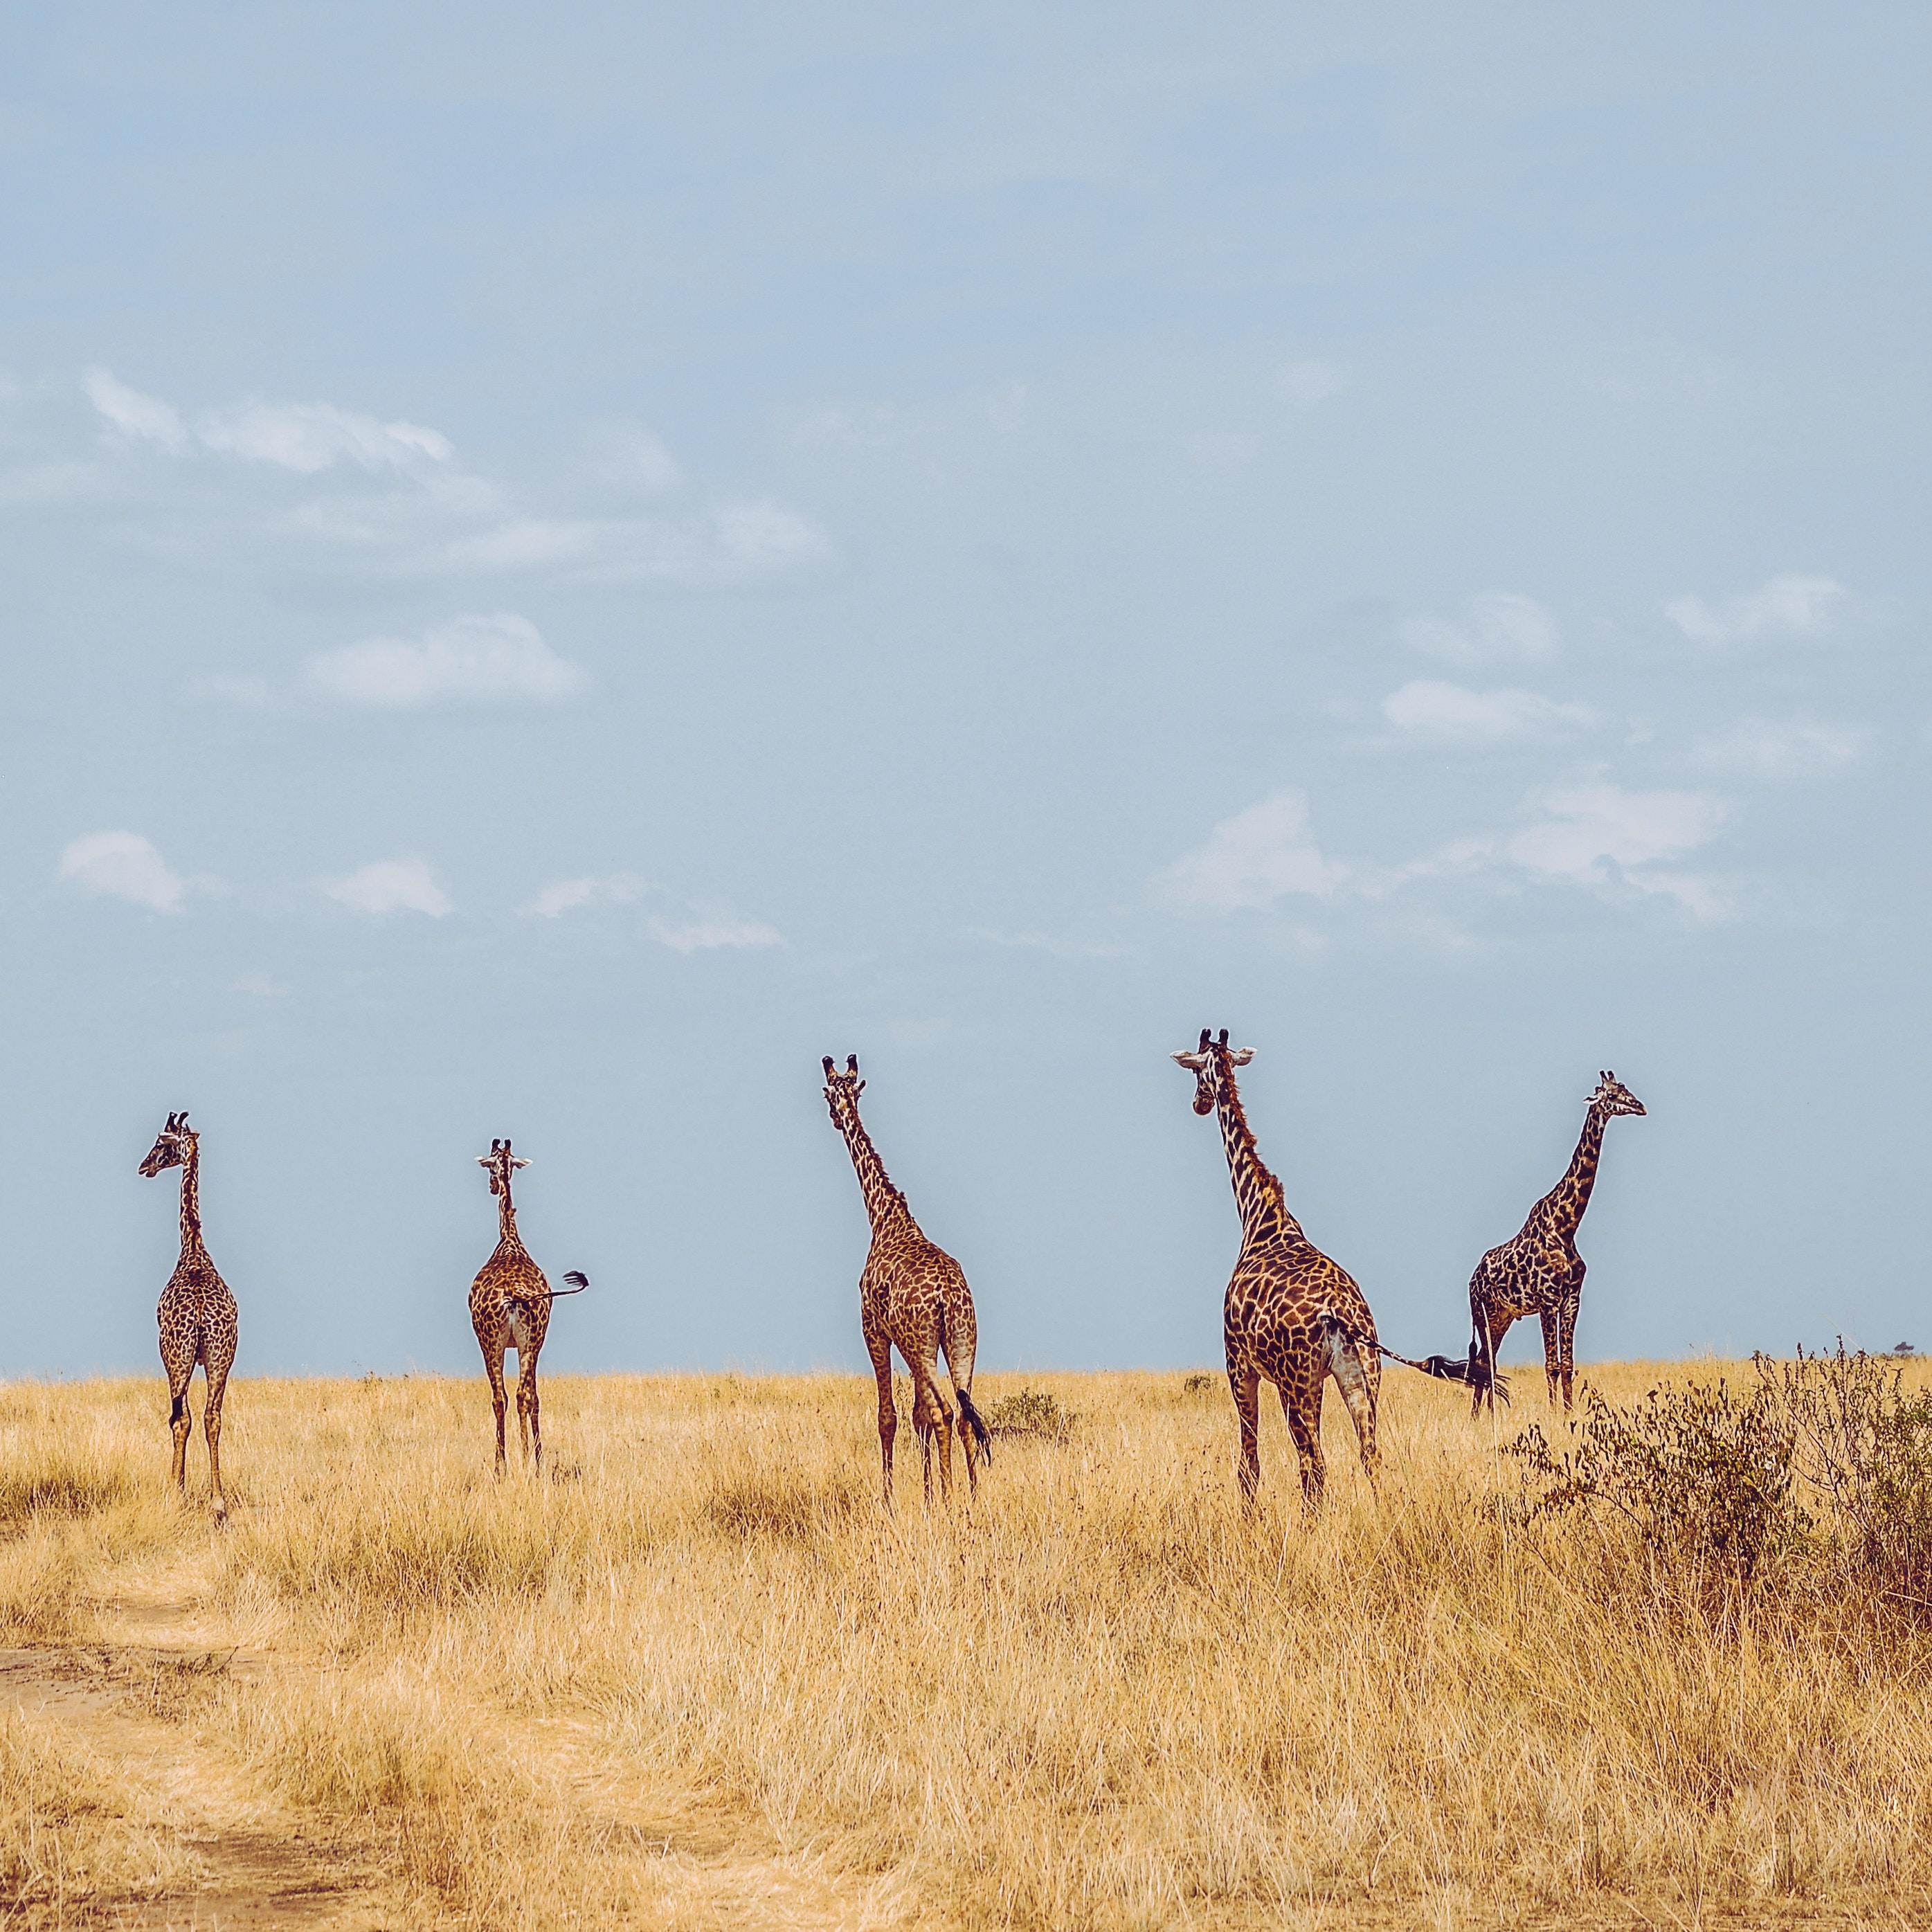 giraffes grazing on the African savant